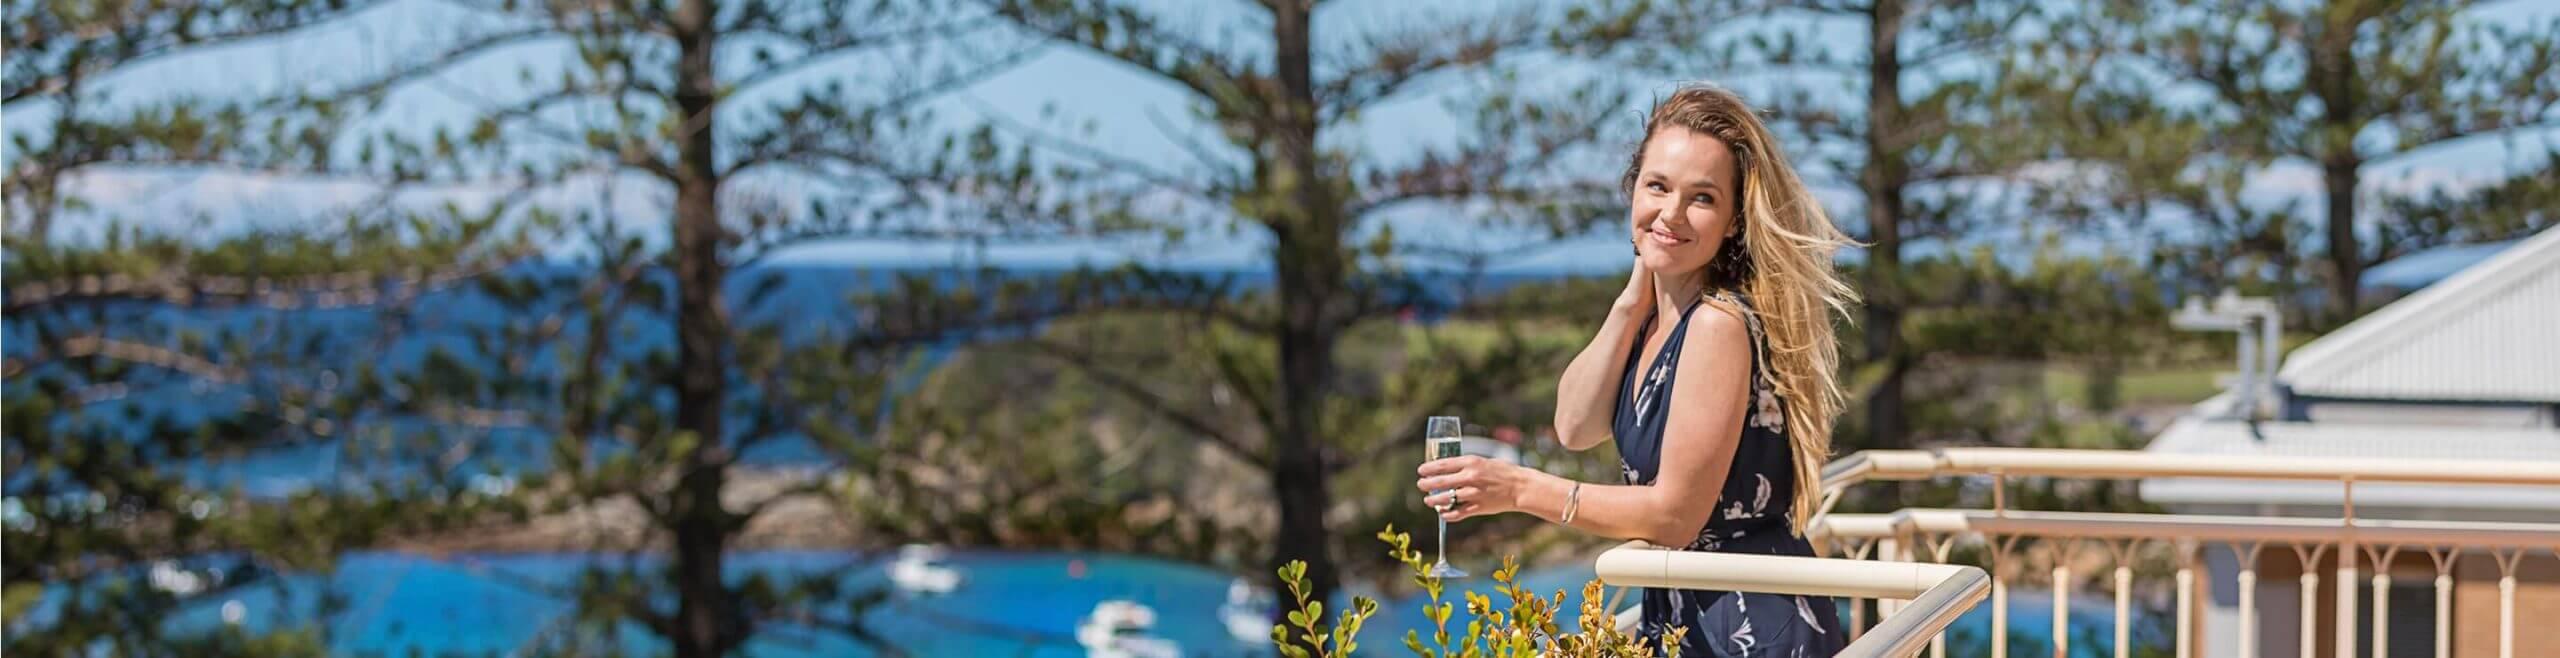 woman posing on balcony